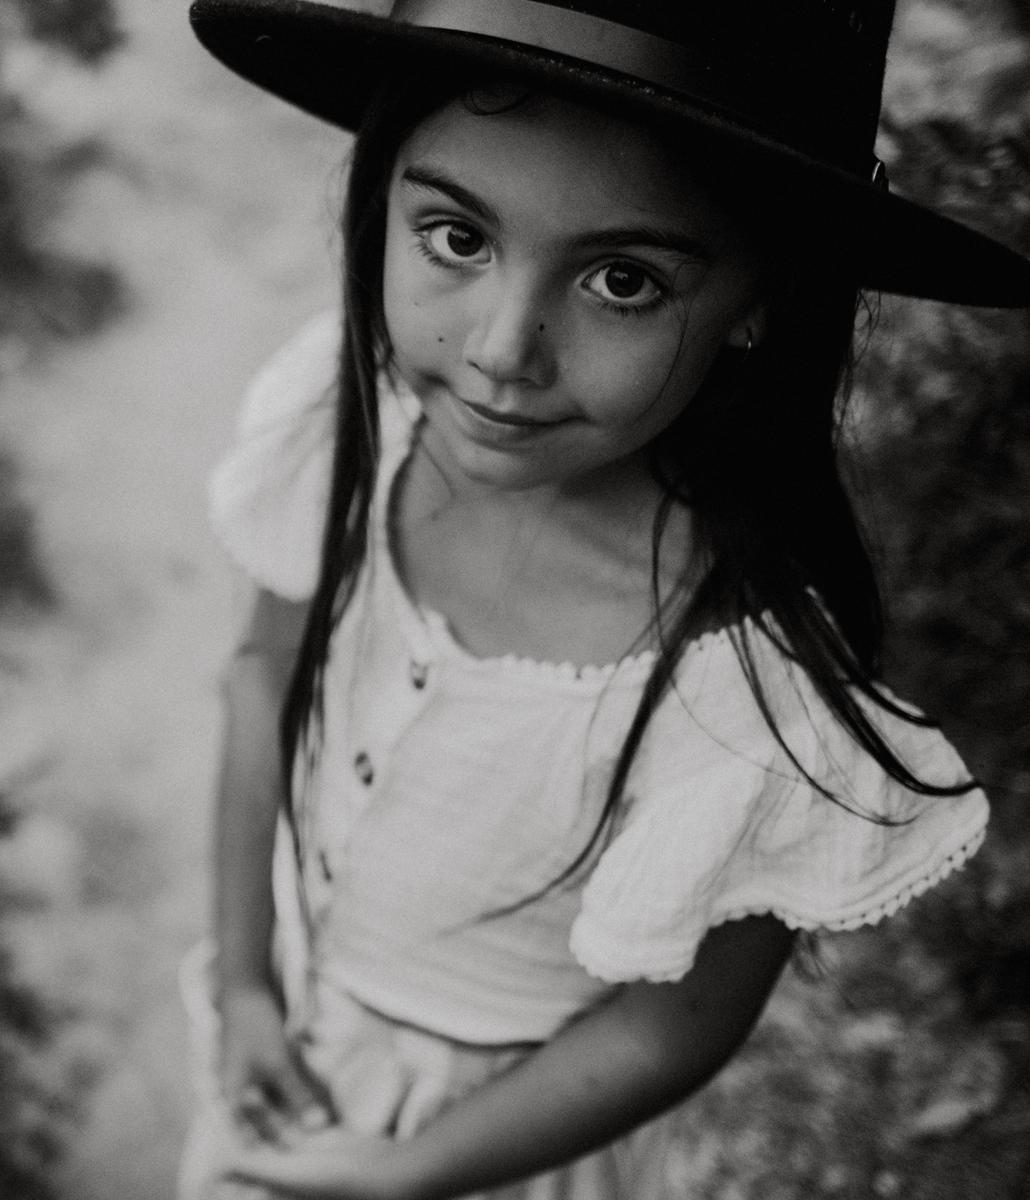 warro_family_Alex_Warden_photography52.jpg